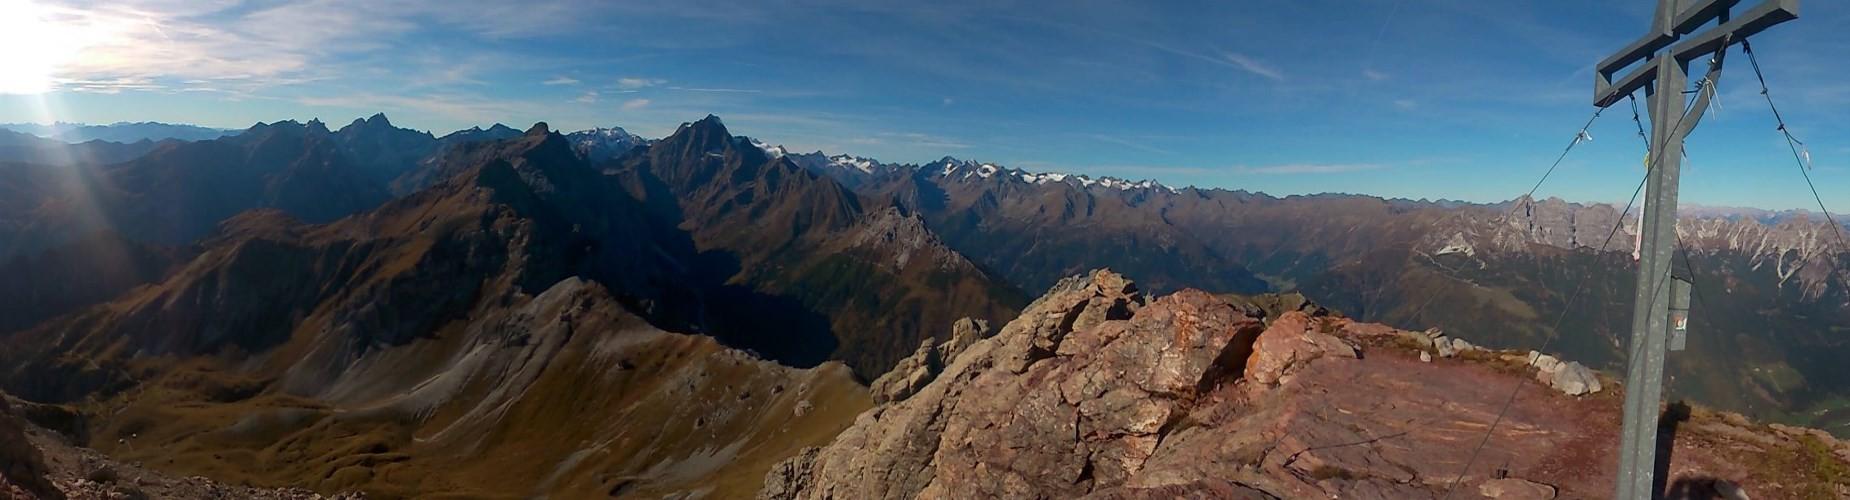 Stubaital Tirol